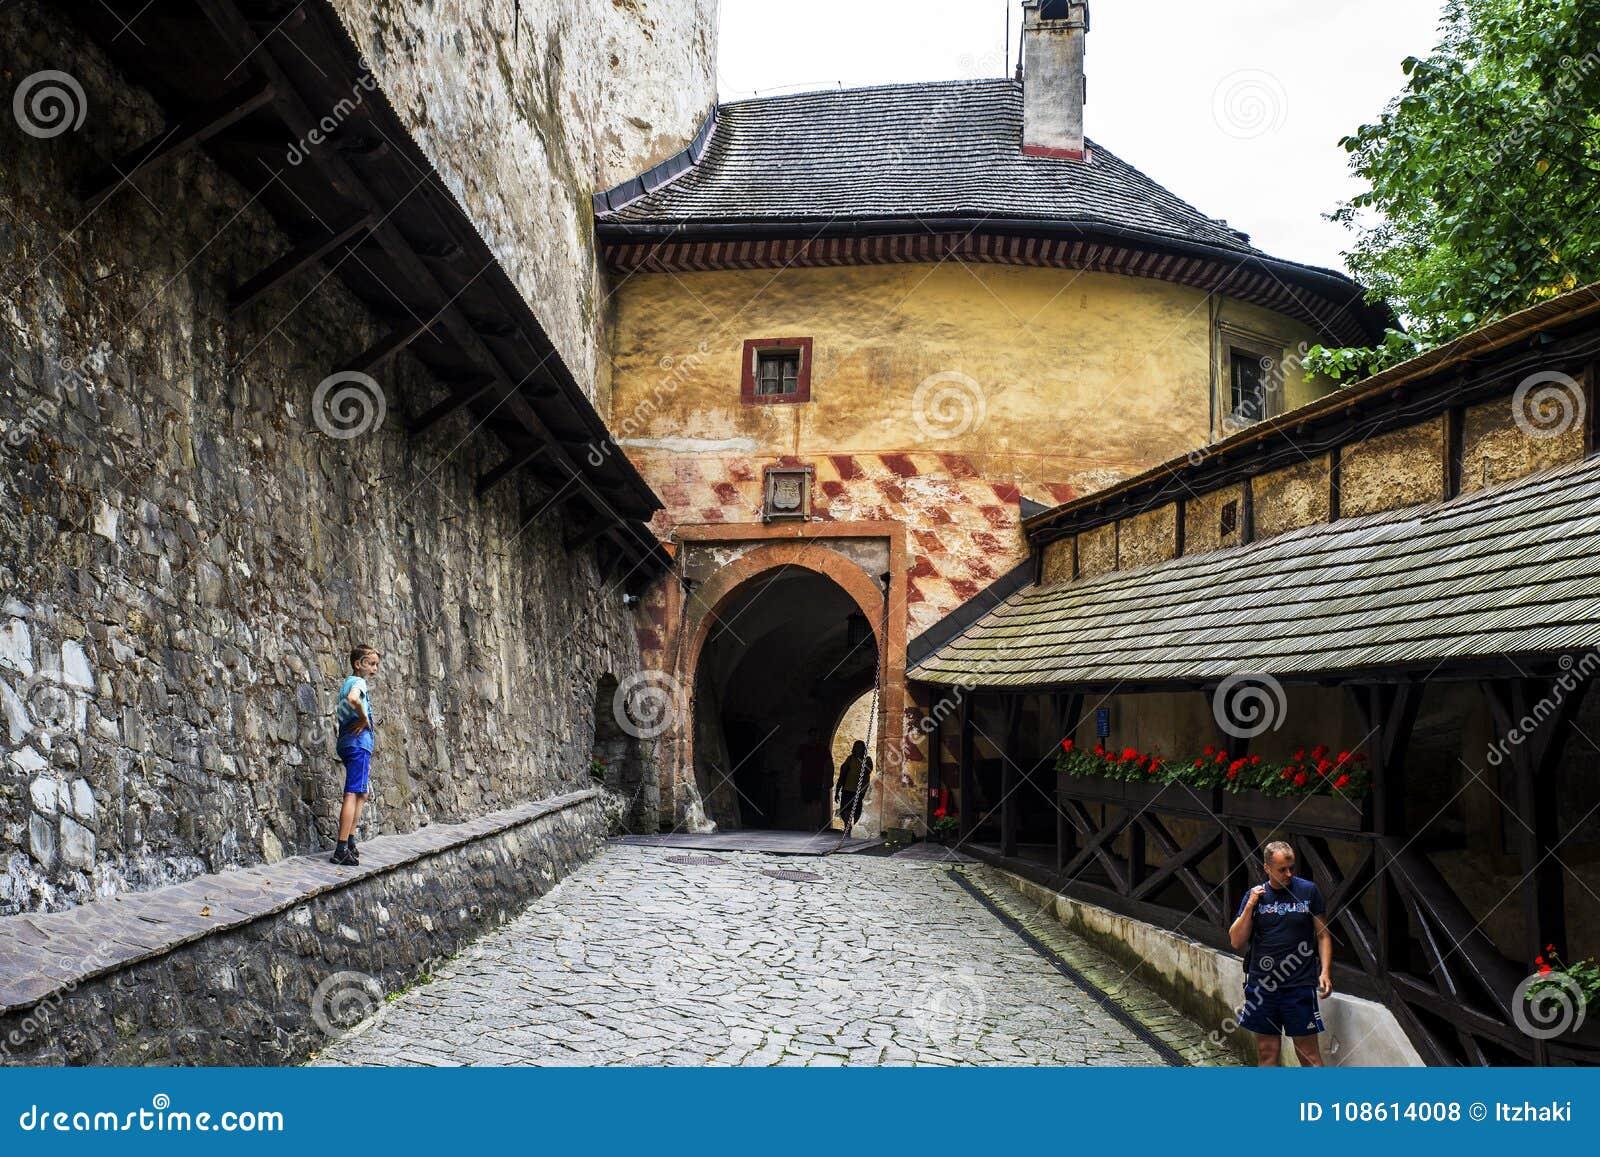 Main gate to Orava Castle, Slovakia